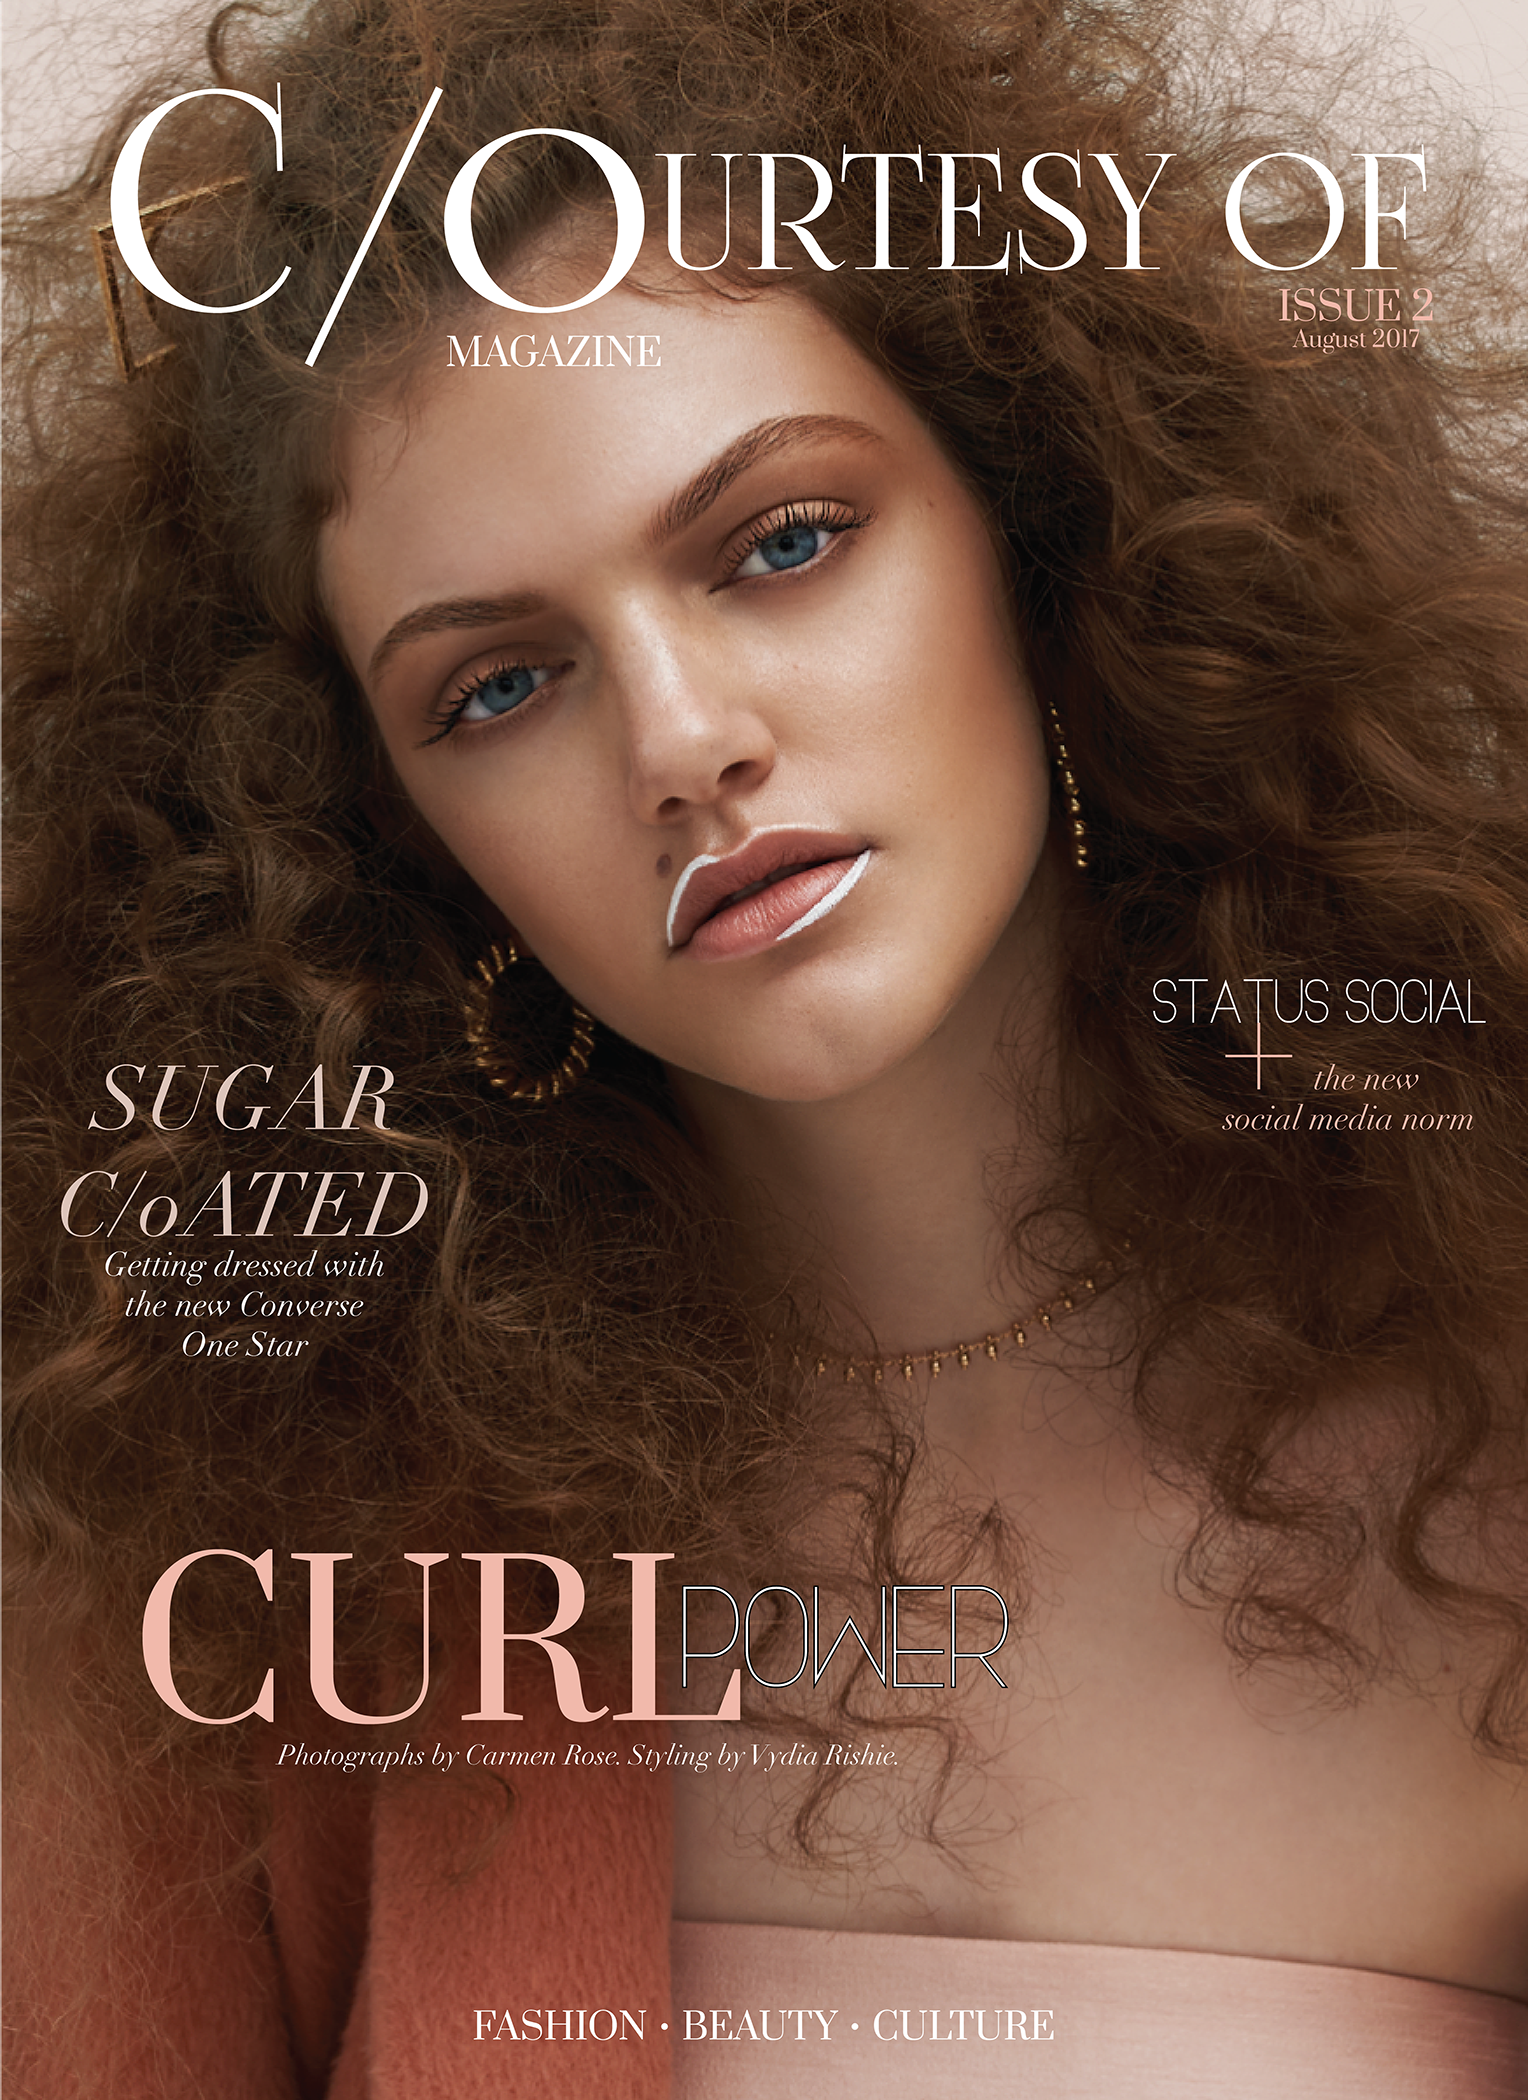 CURLPOWER - C/OURTESY OF Magazine